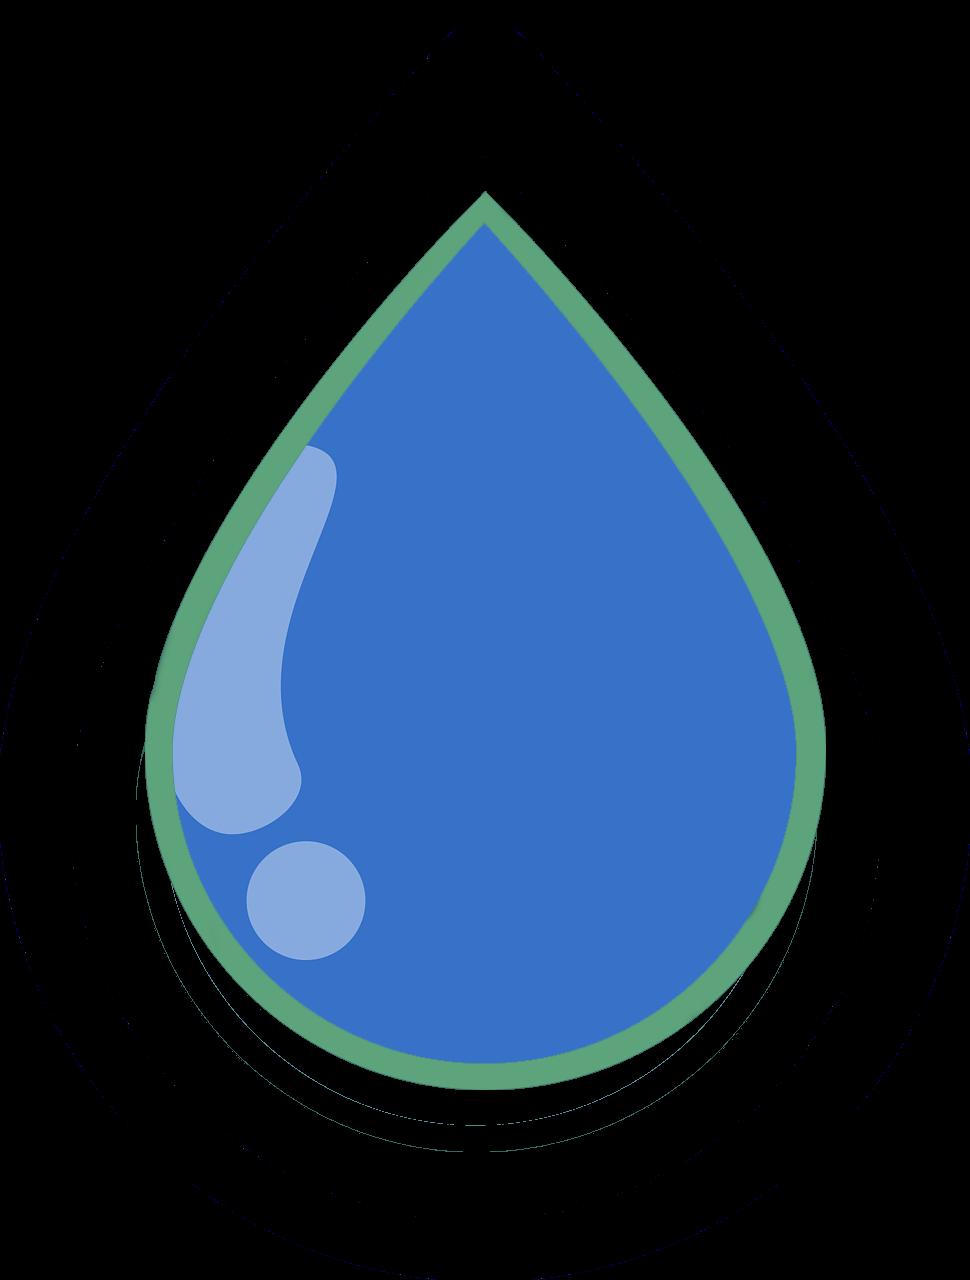 columbia-basin-water-quality-monitoring-program